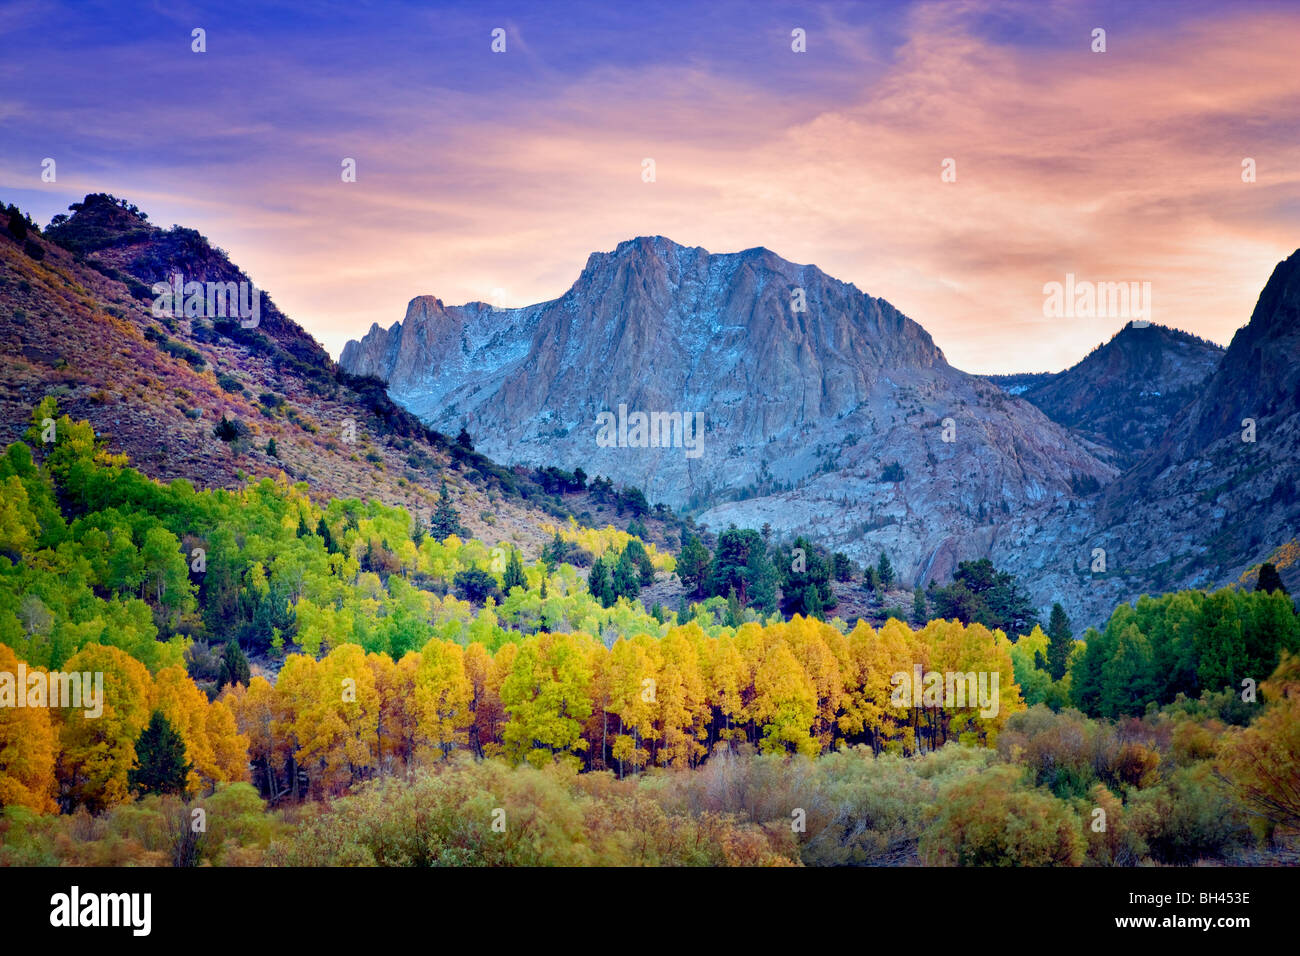 Carson Peak und Herbst farbige Espen. California Stockbild